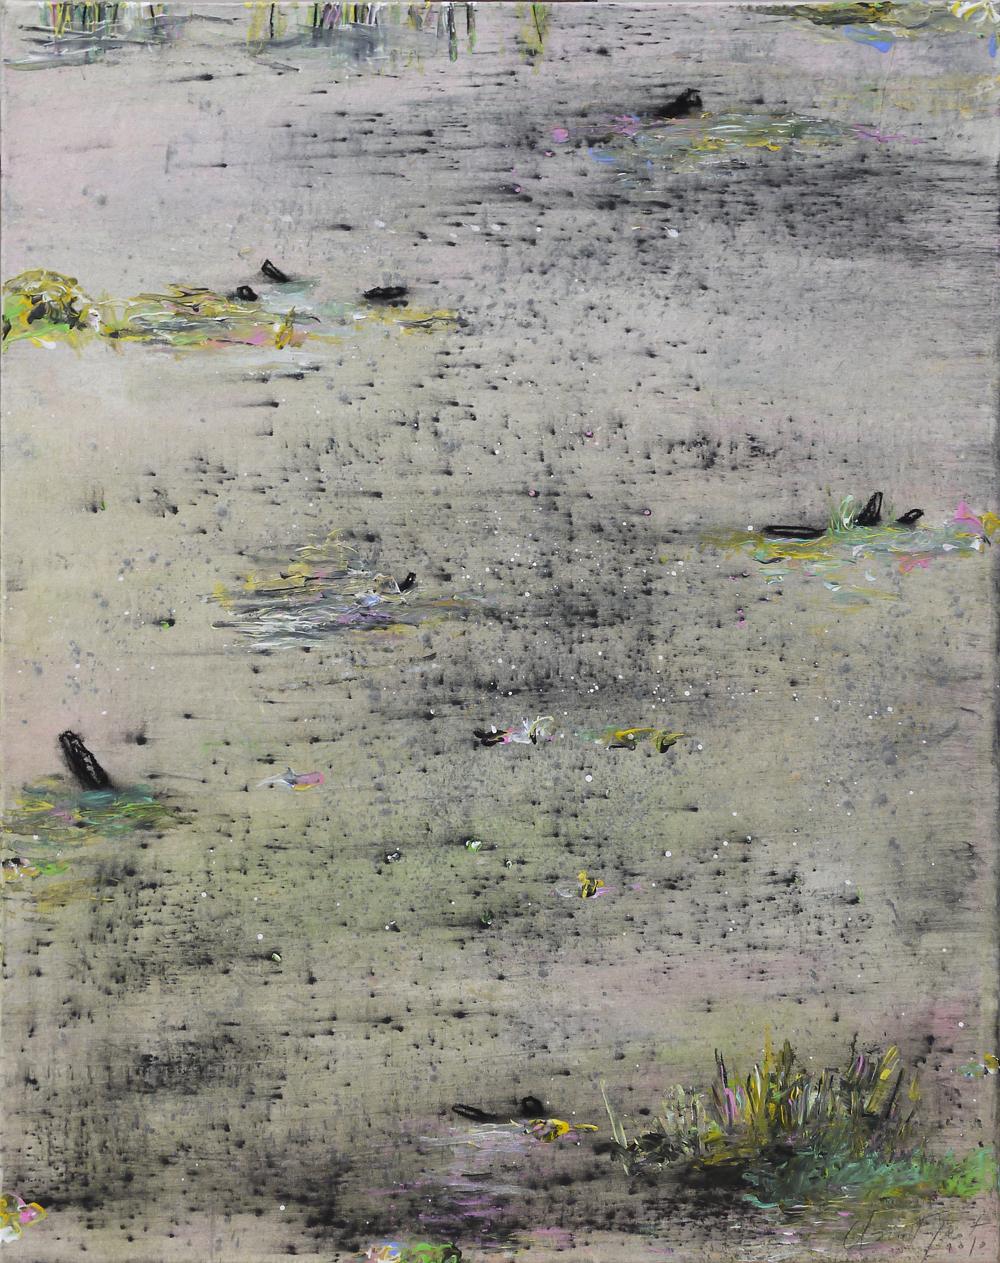 2010 - Rivière / River n°3